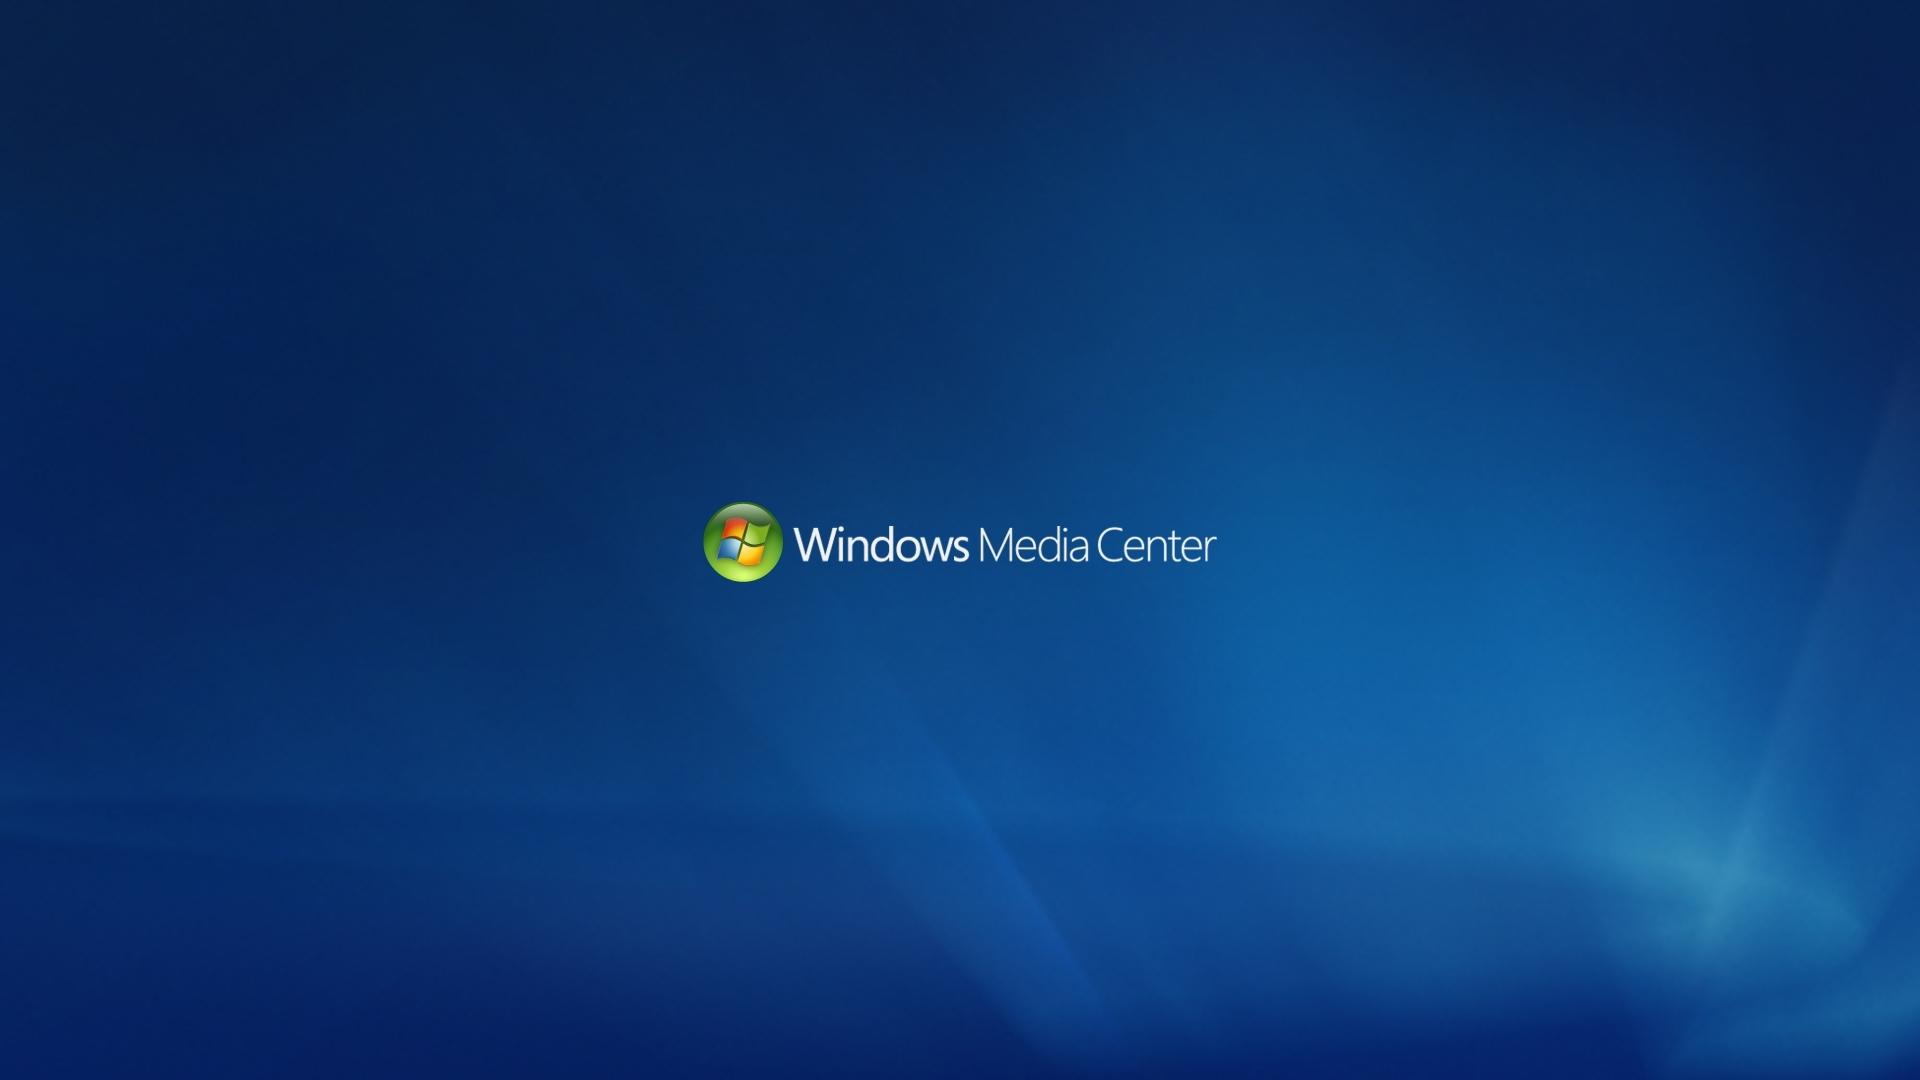 windows media center - walldevil